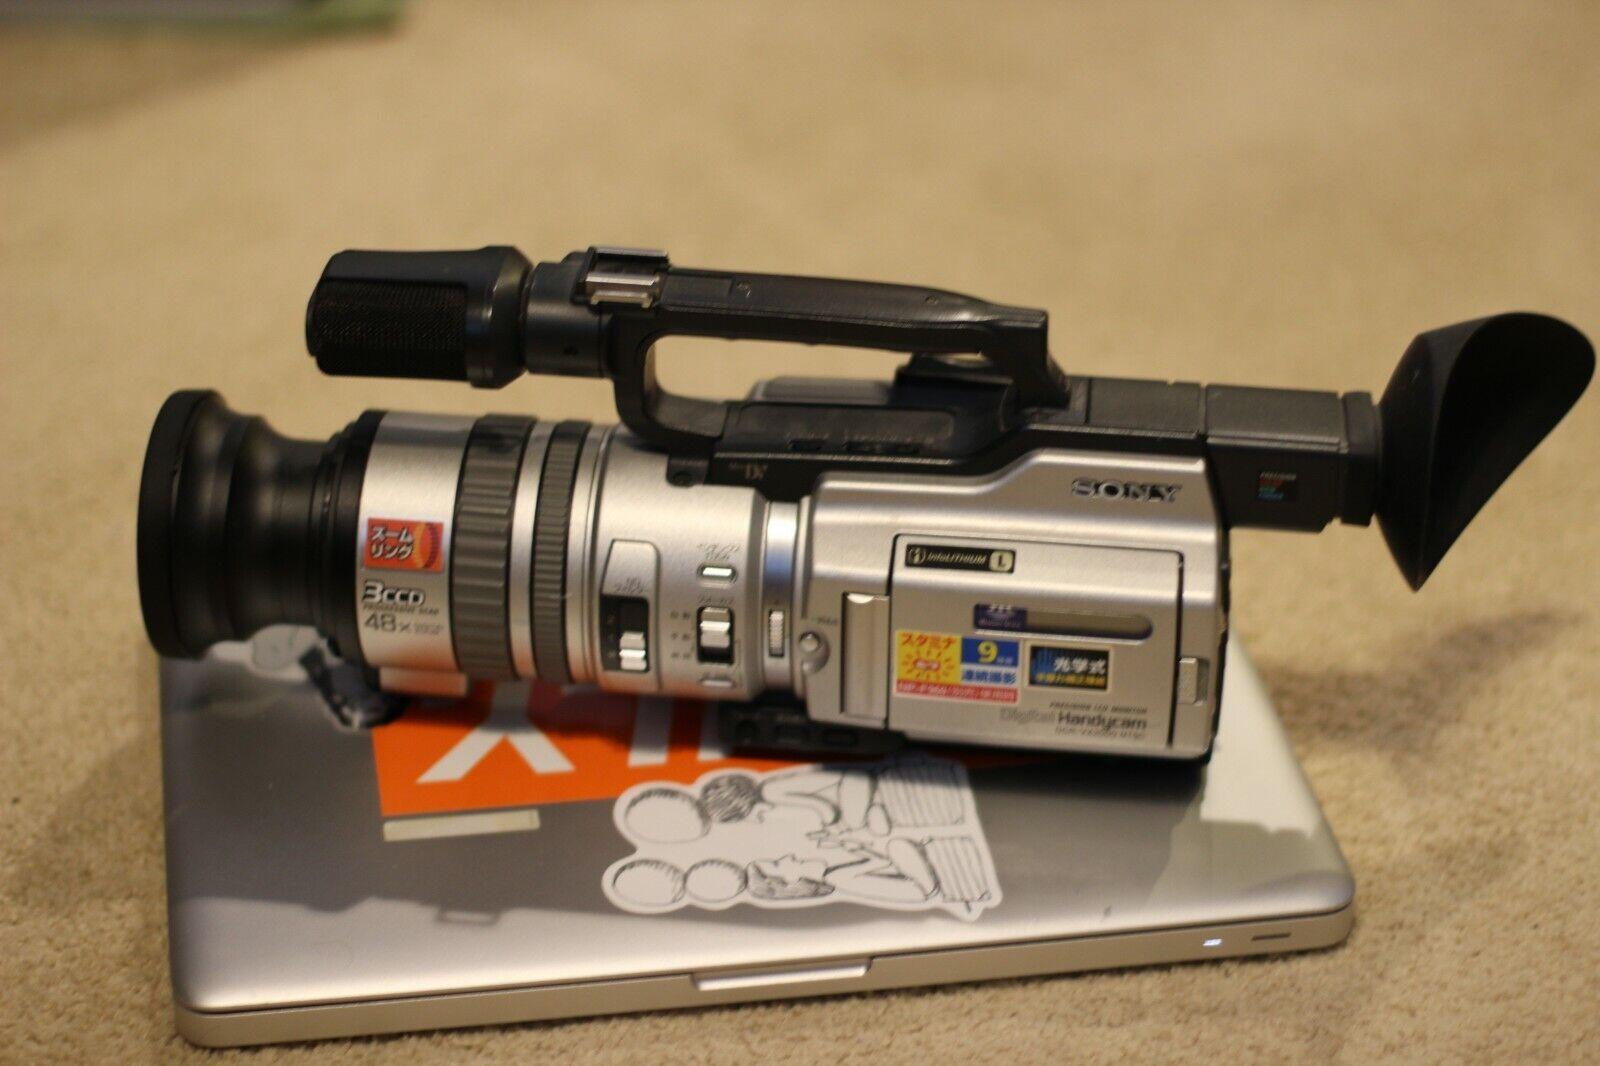 s l1600 - Sony DCR-VX2000 Camcorder (Rare Japan Edition)